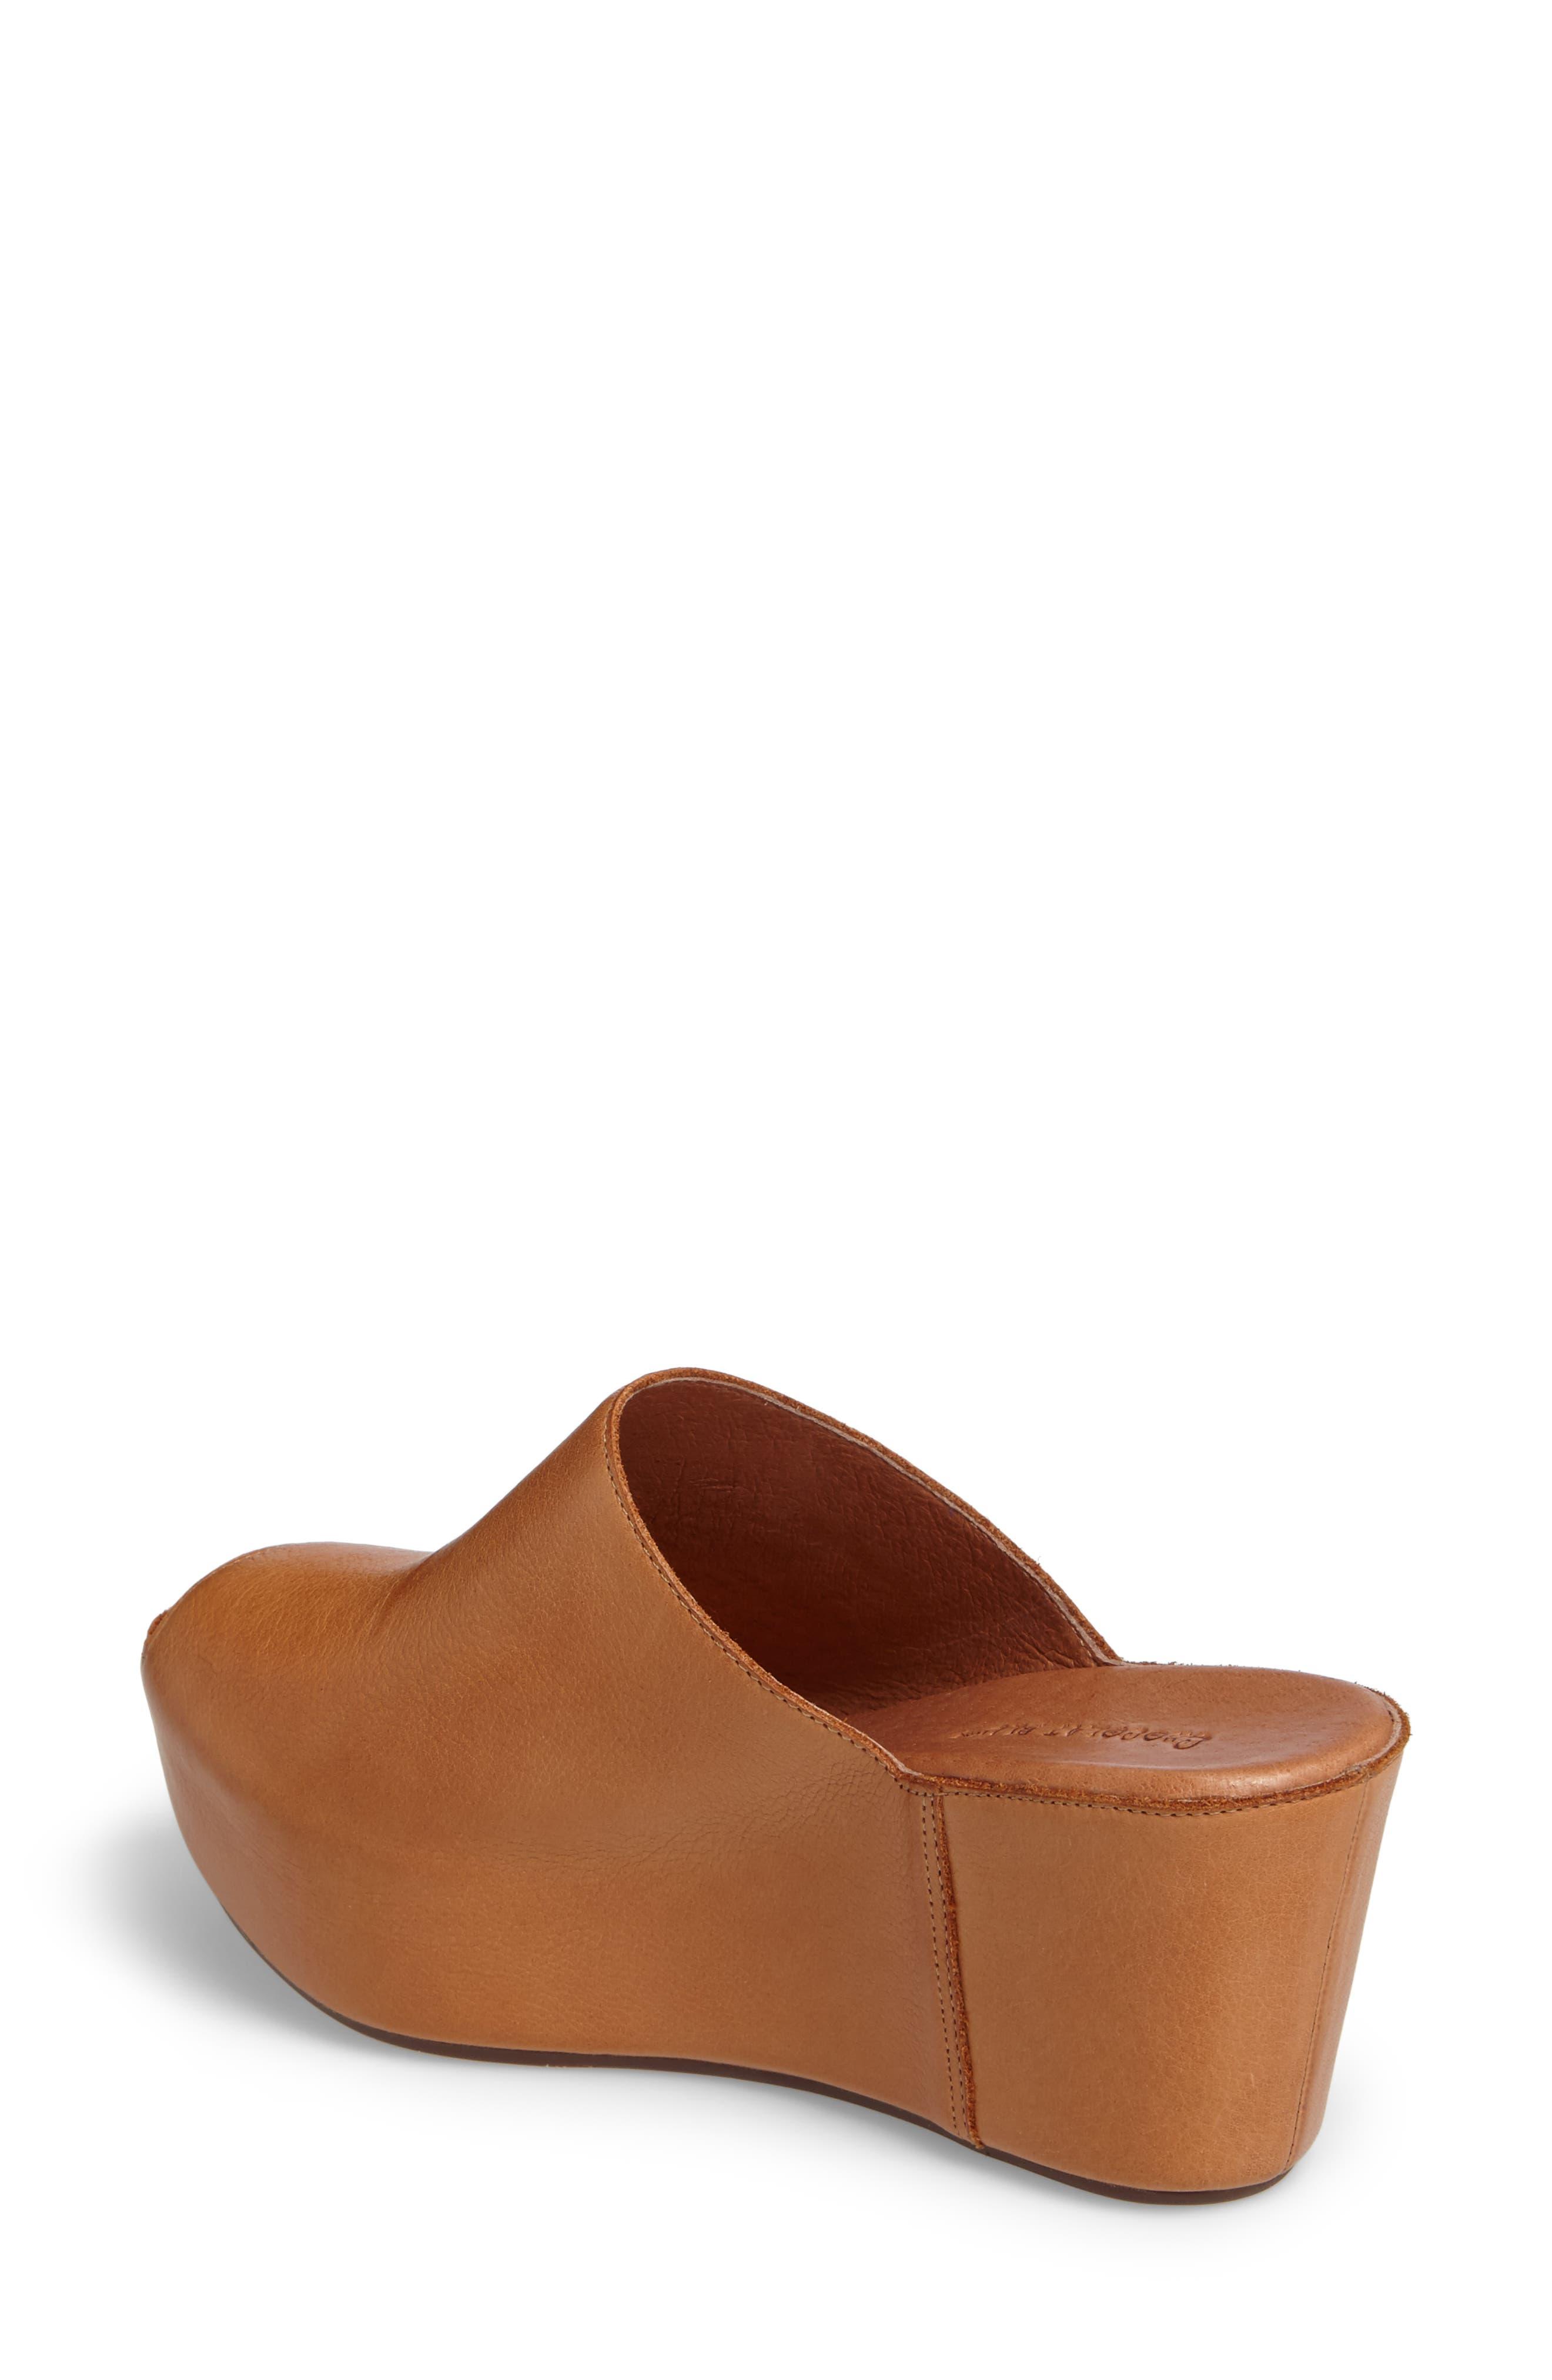 Willa Platform Wedge Mule,                             Alternate thumbnail 2, color,                             Camel Leather